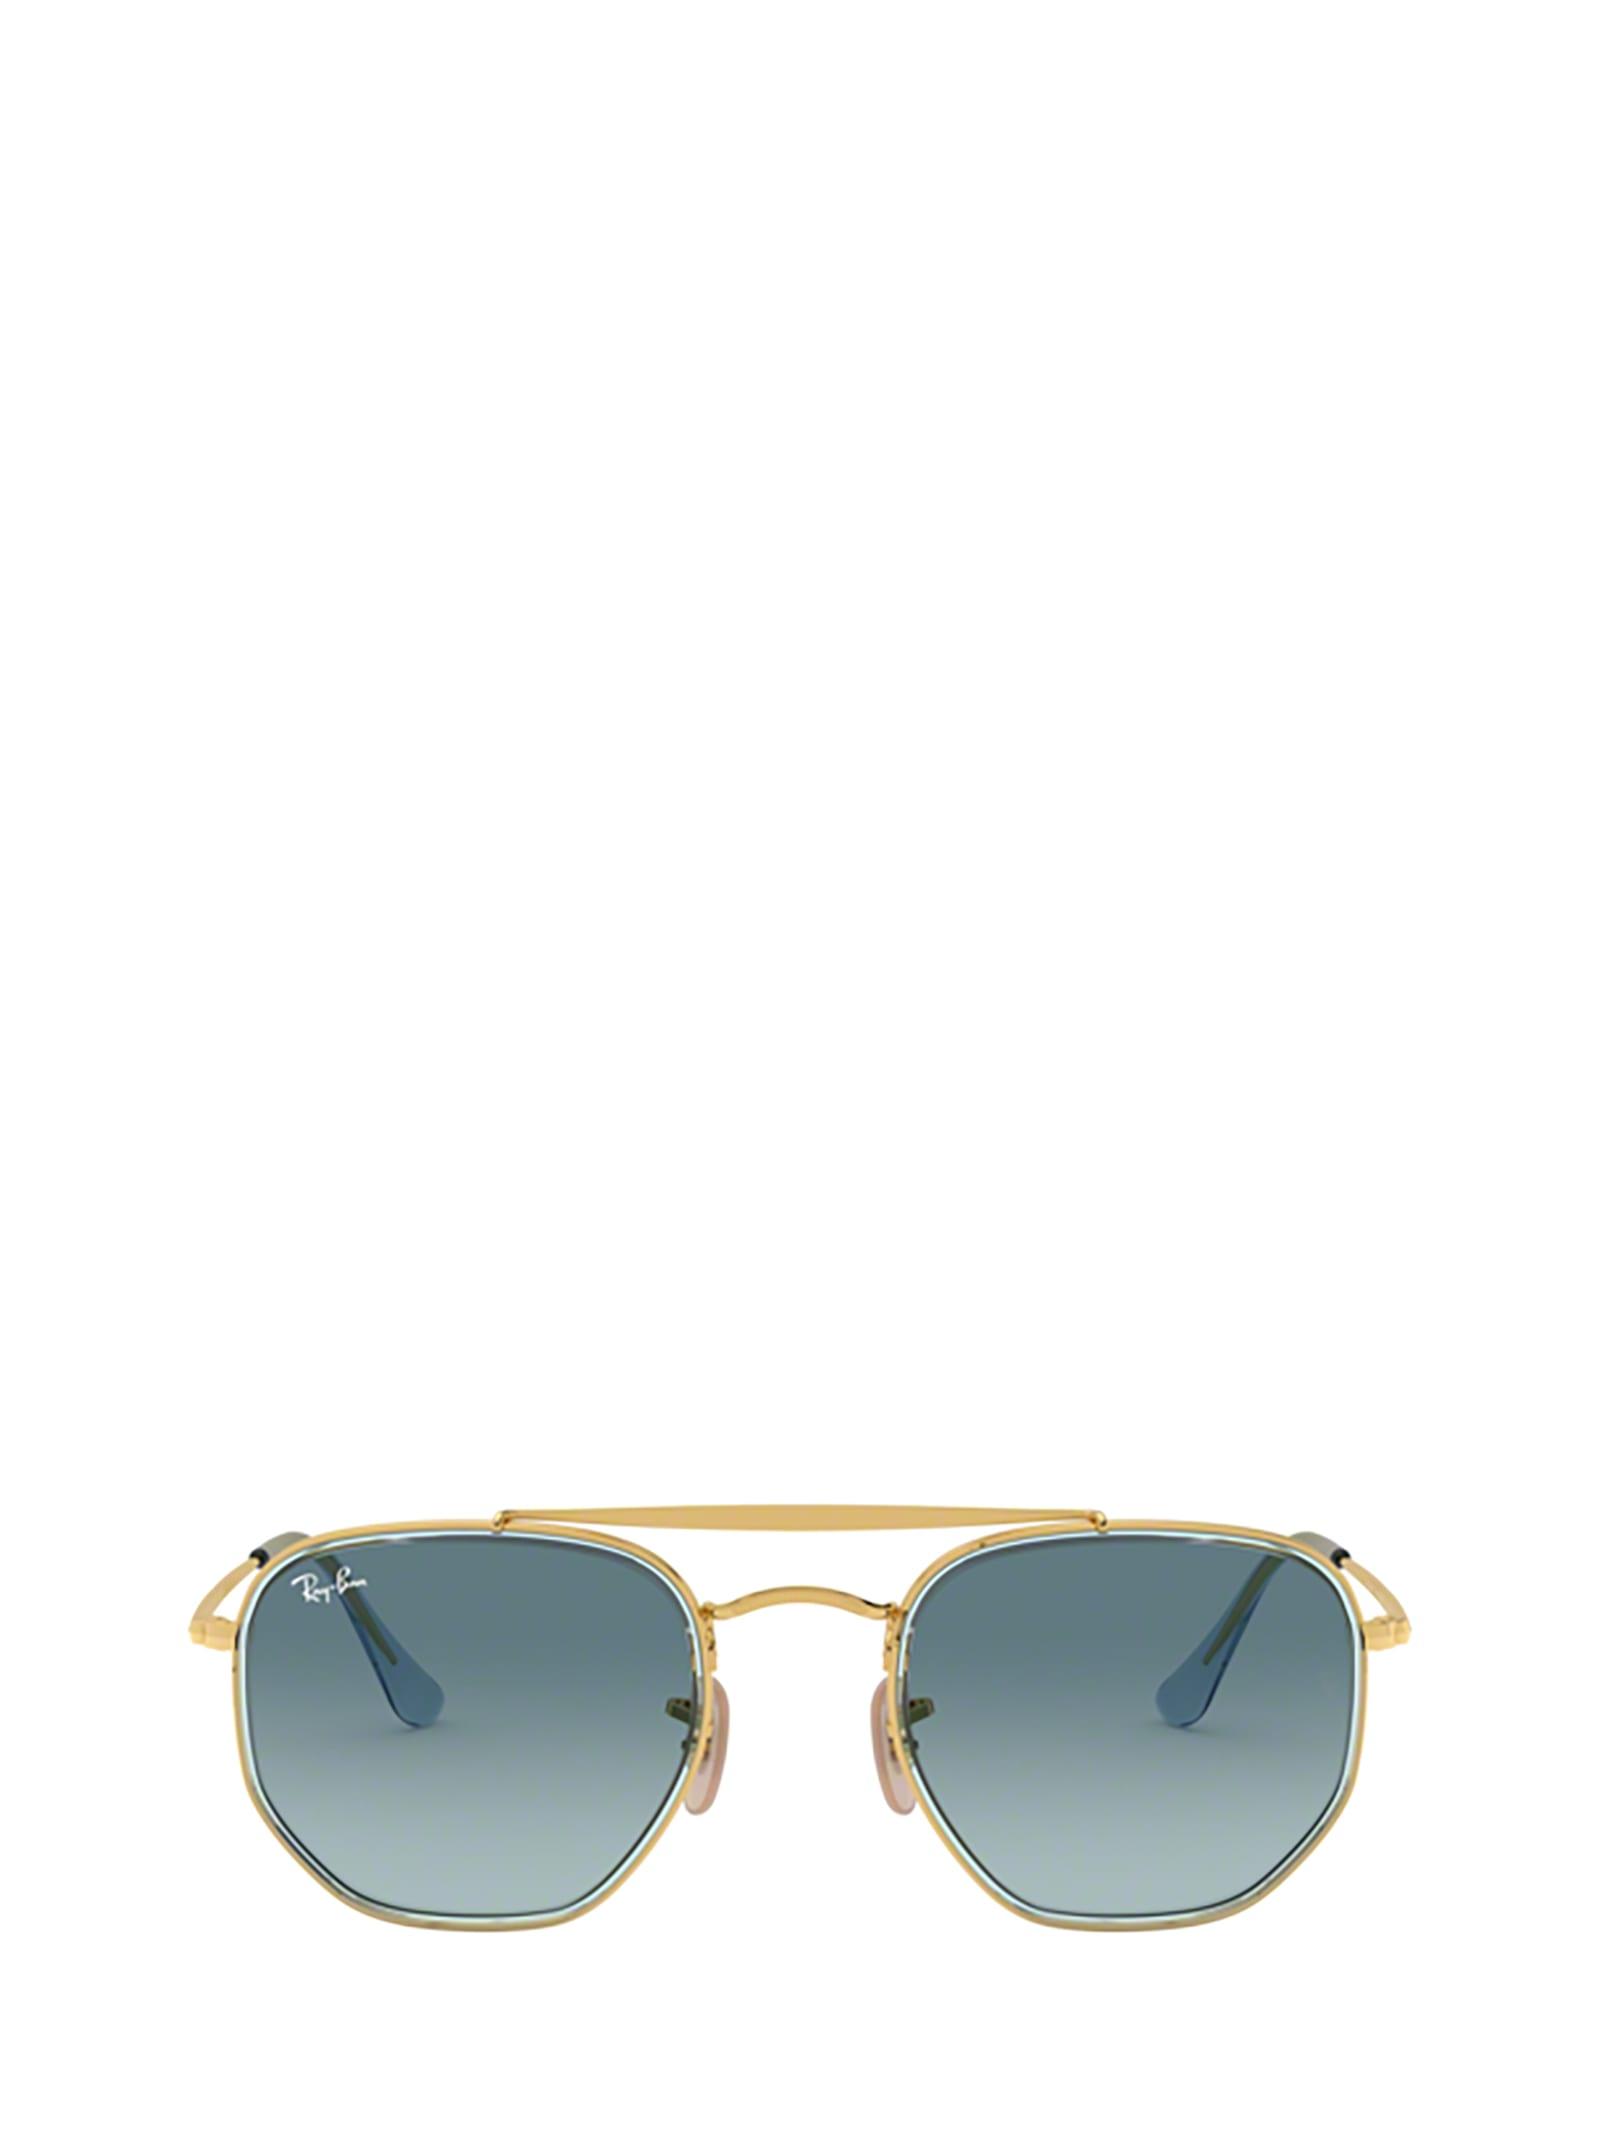 Ray-Ban Ray-ban Rb3648m Arista Sunglasses